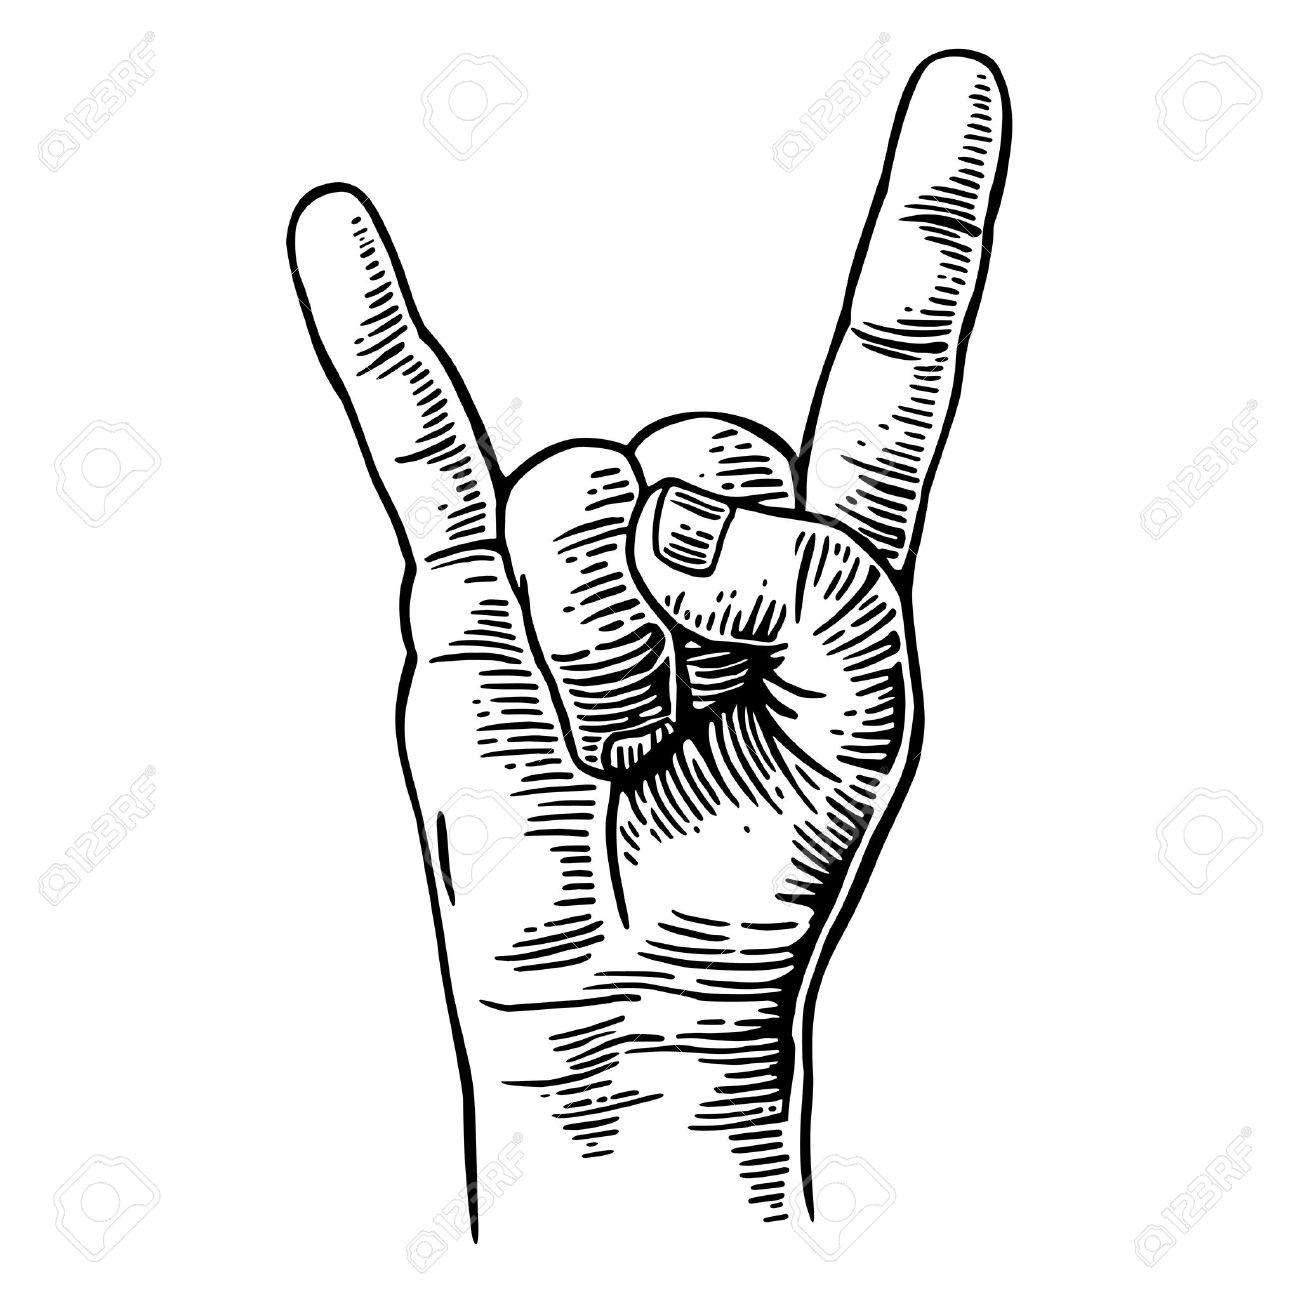 Rock and Roll hand sign. Vector black vintage engraved illustration. Hand giving the devil horns gesture - 54777096